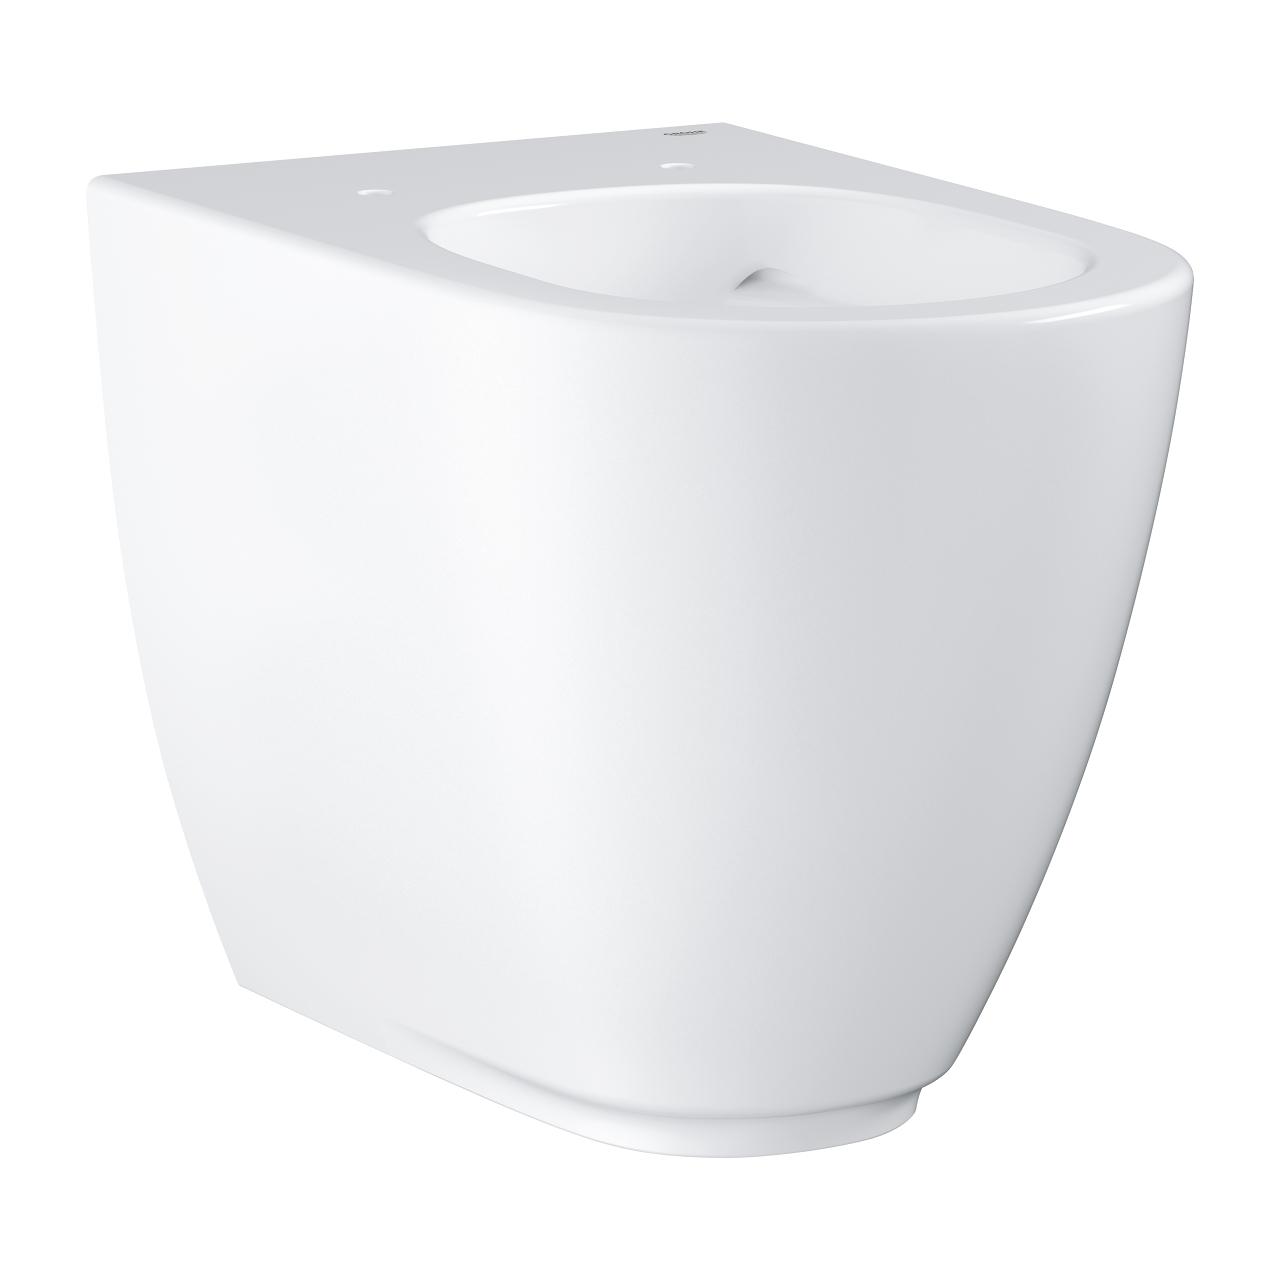 GROHE Стояща тоалетна долепена до стената ESSENCE 3957300H